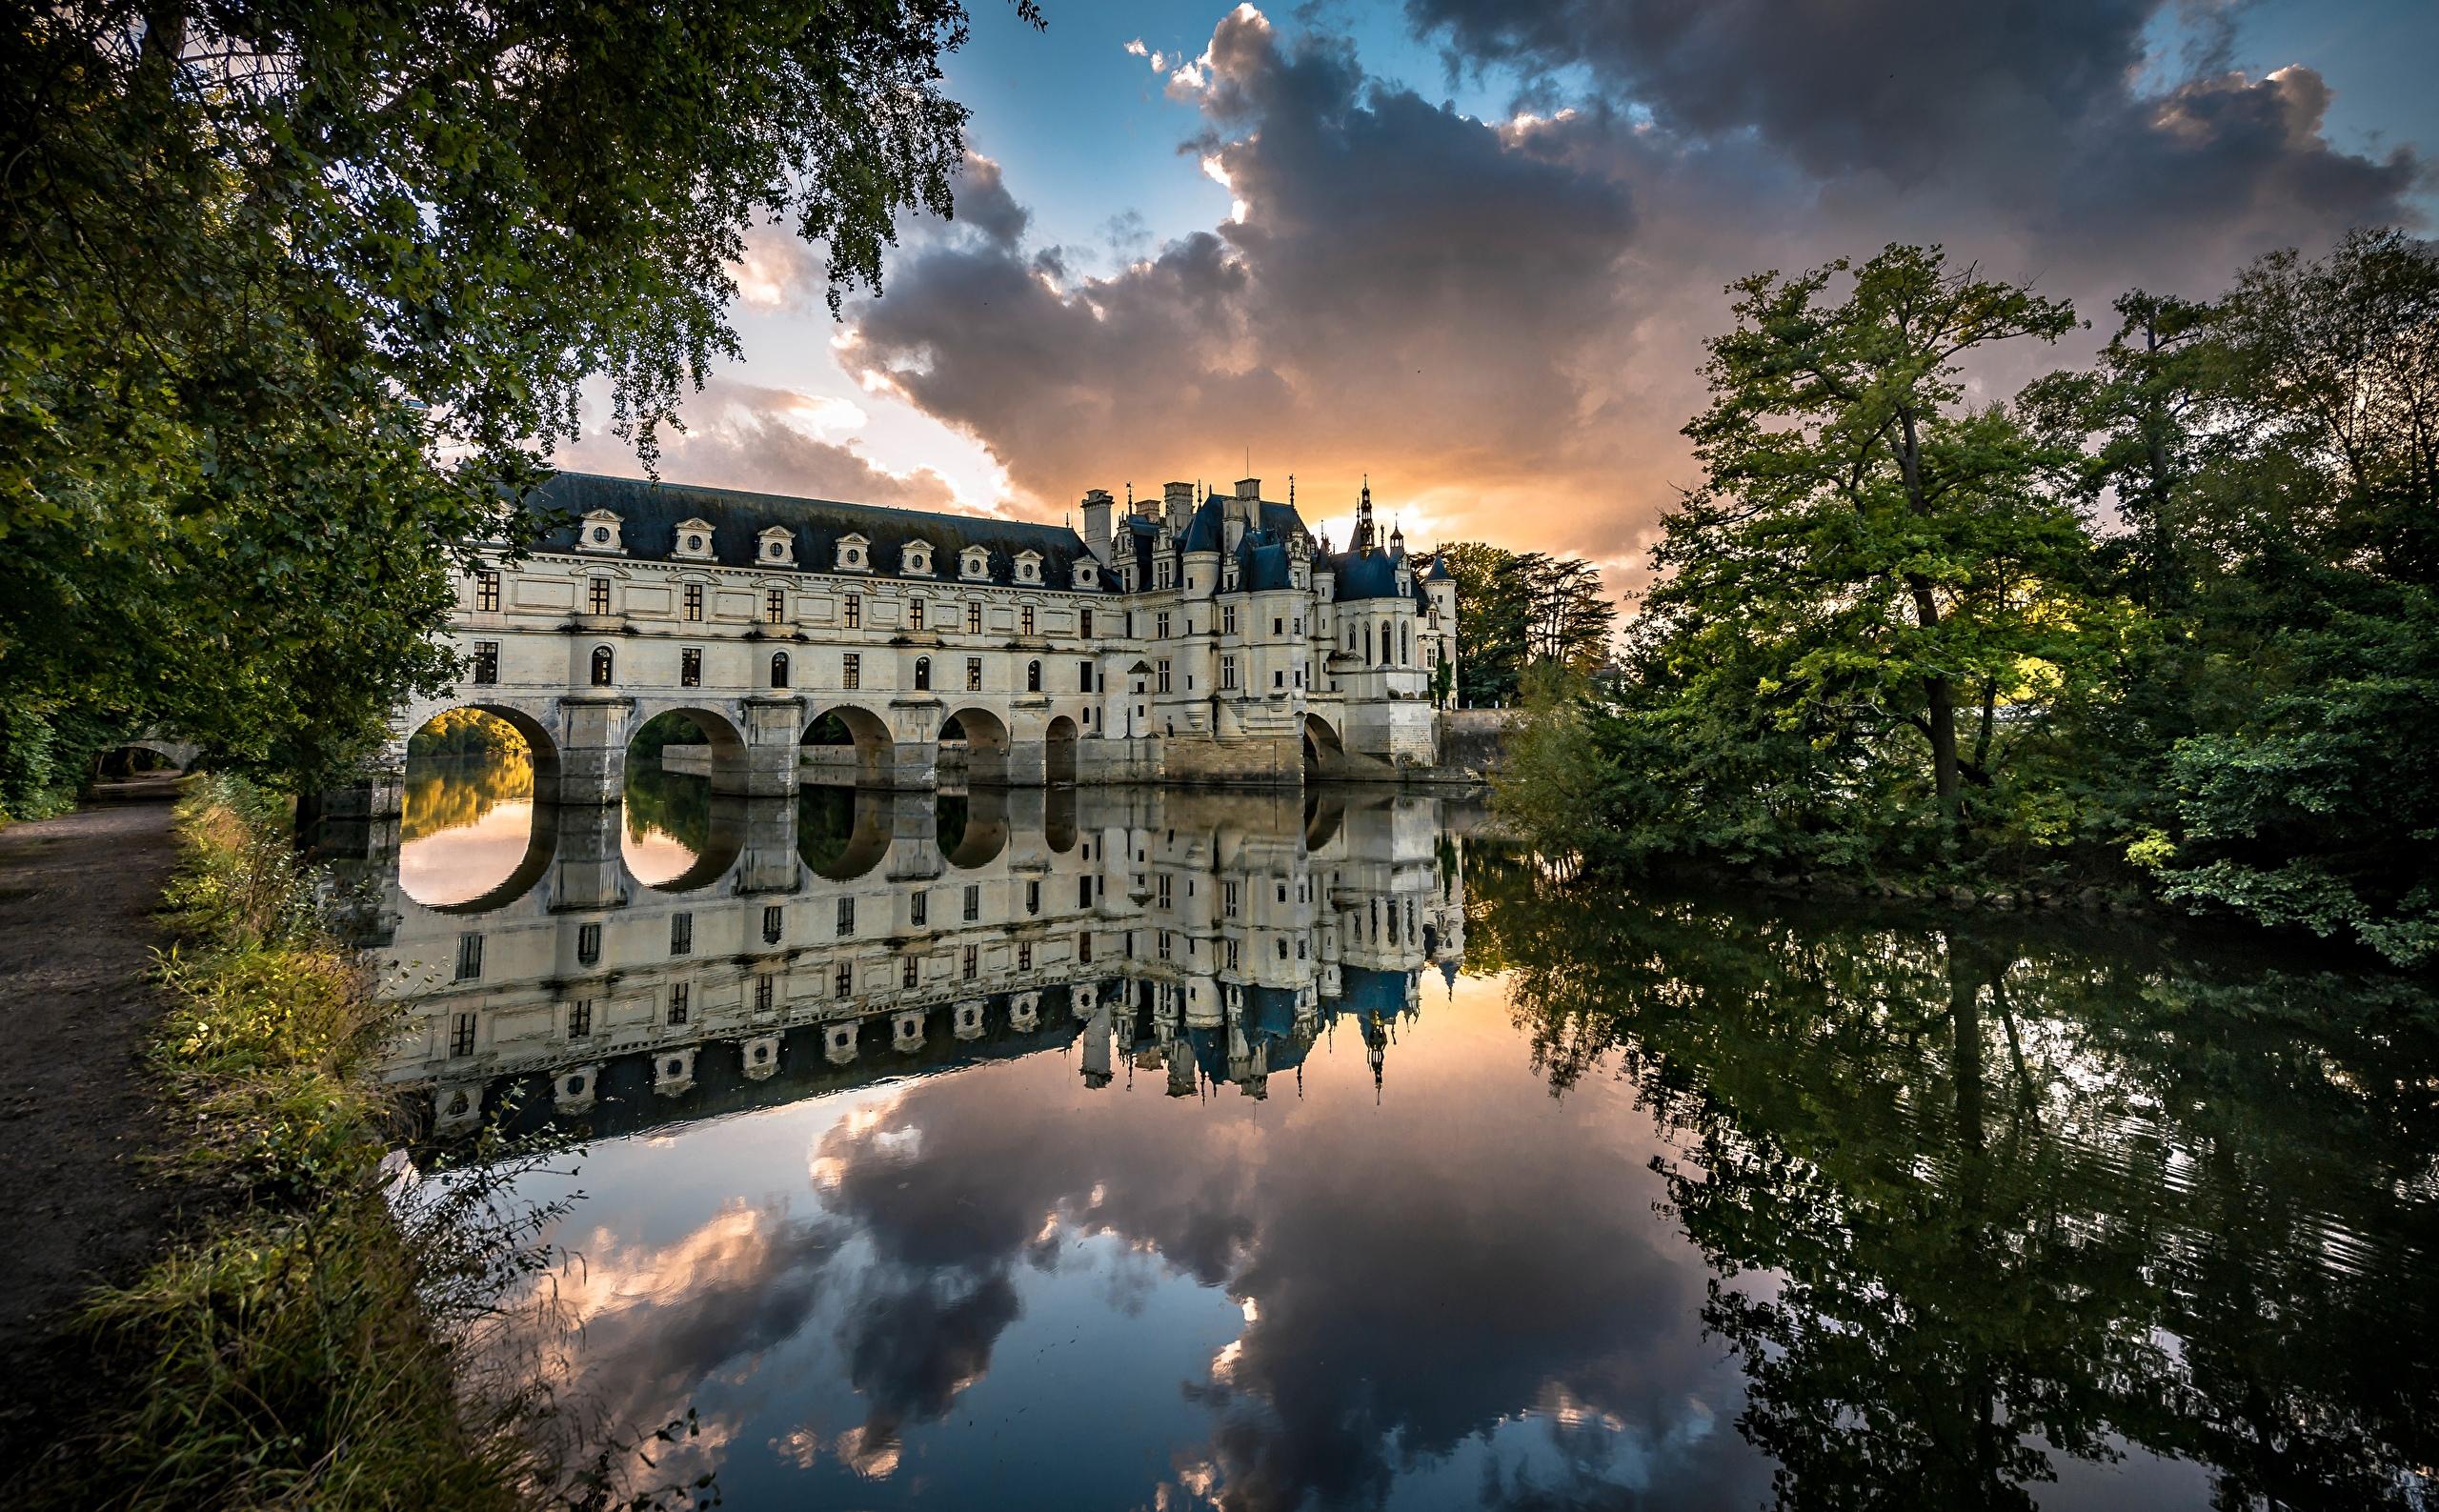 Фото Франция башни Château de Chenonceau замок Природа Отражение Реки деревьев 2560x1587 Башня Замки отражении отражается река речка дерево дерева Деревья